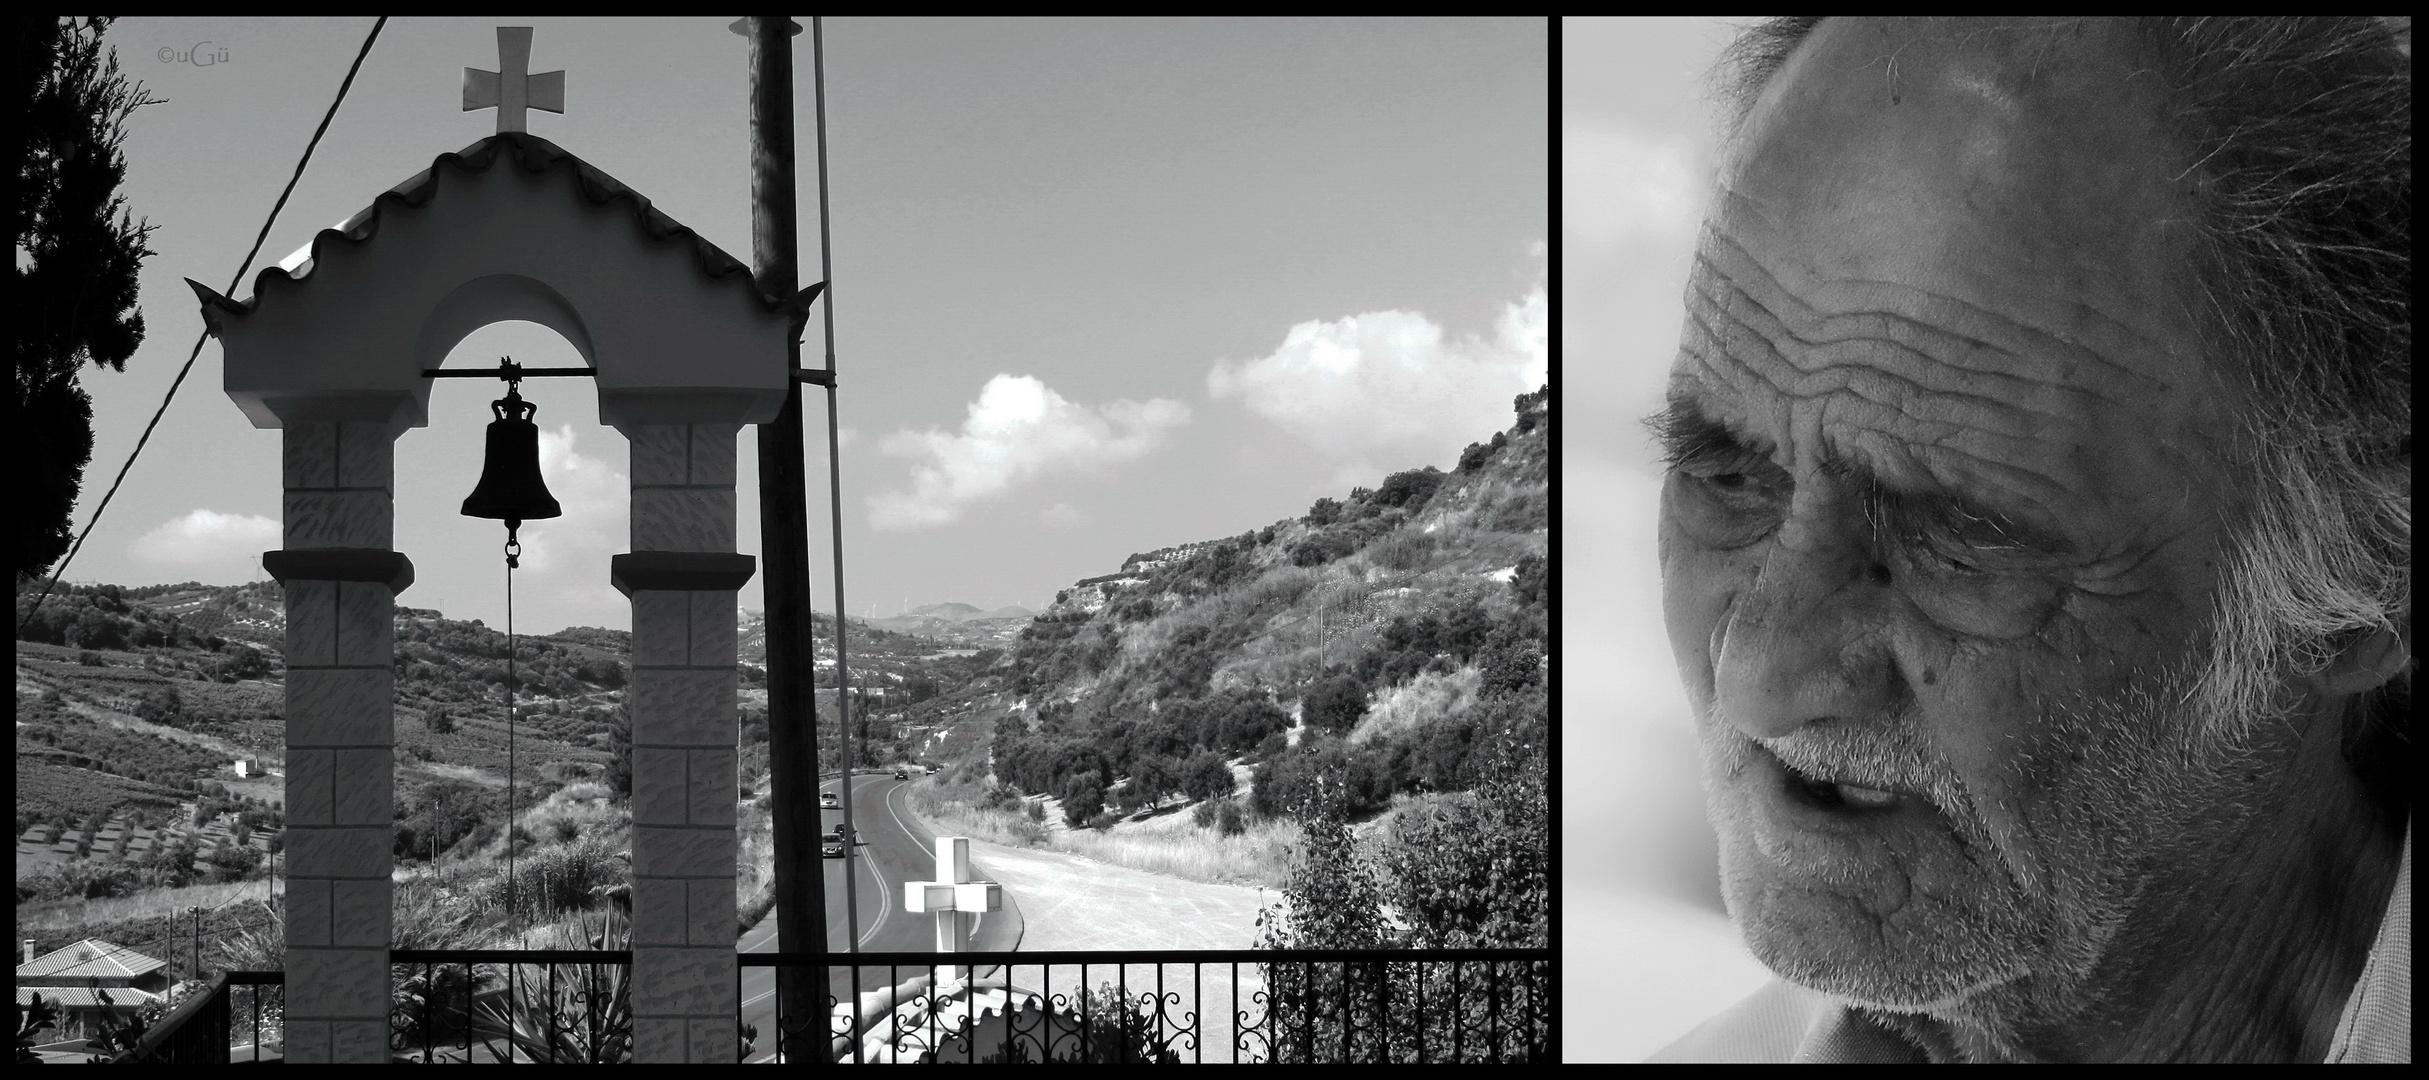 an old Crete man